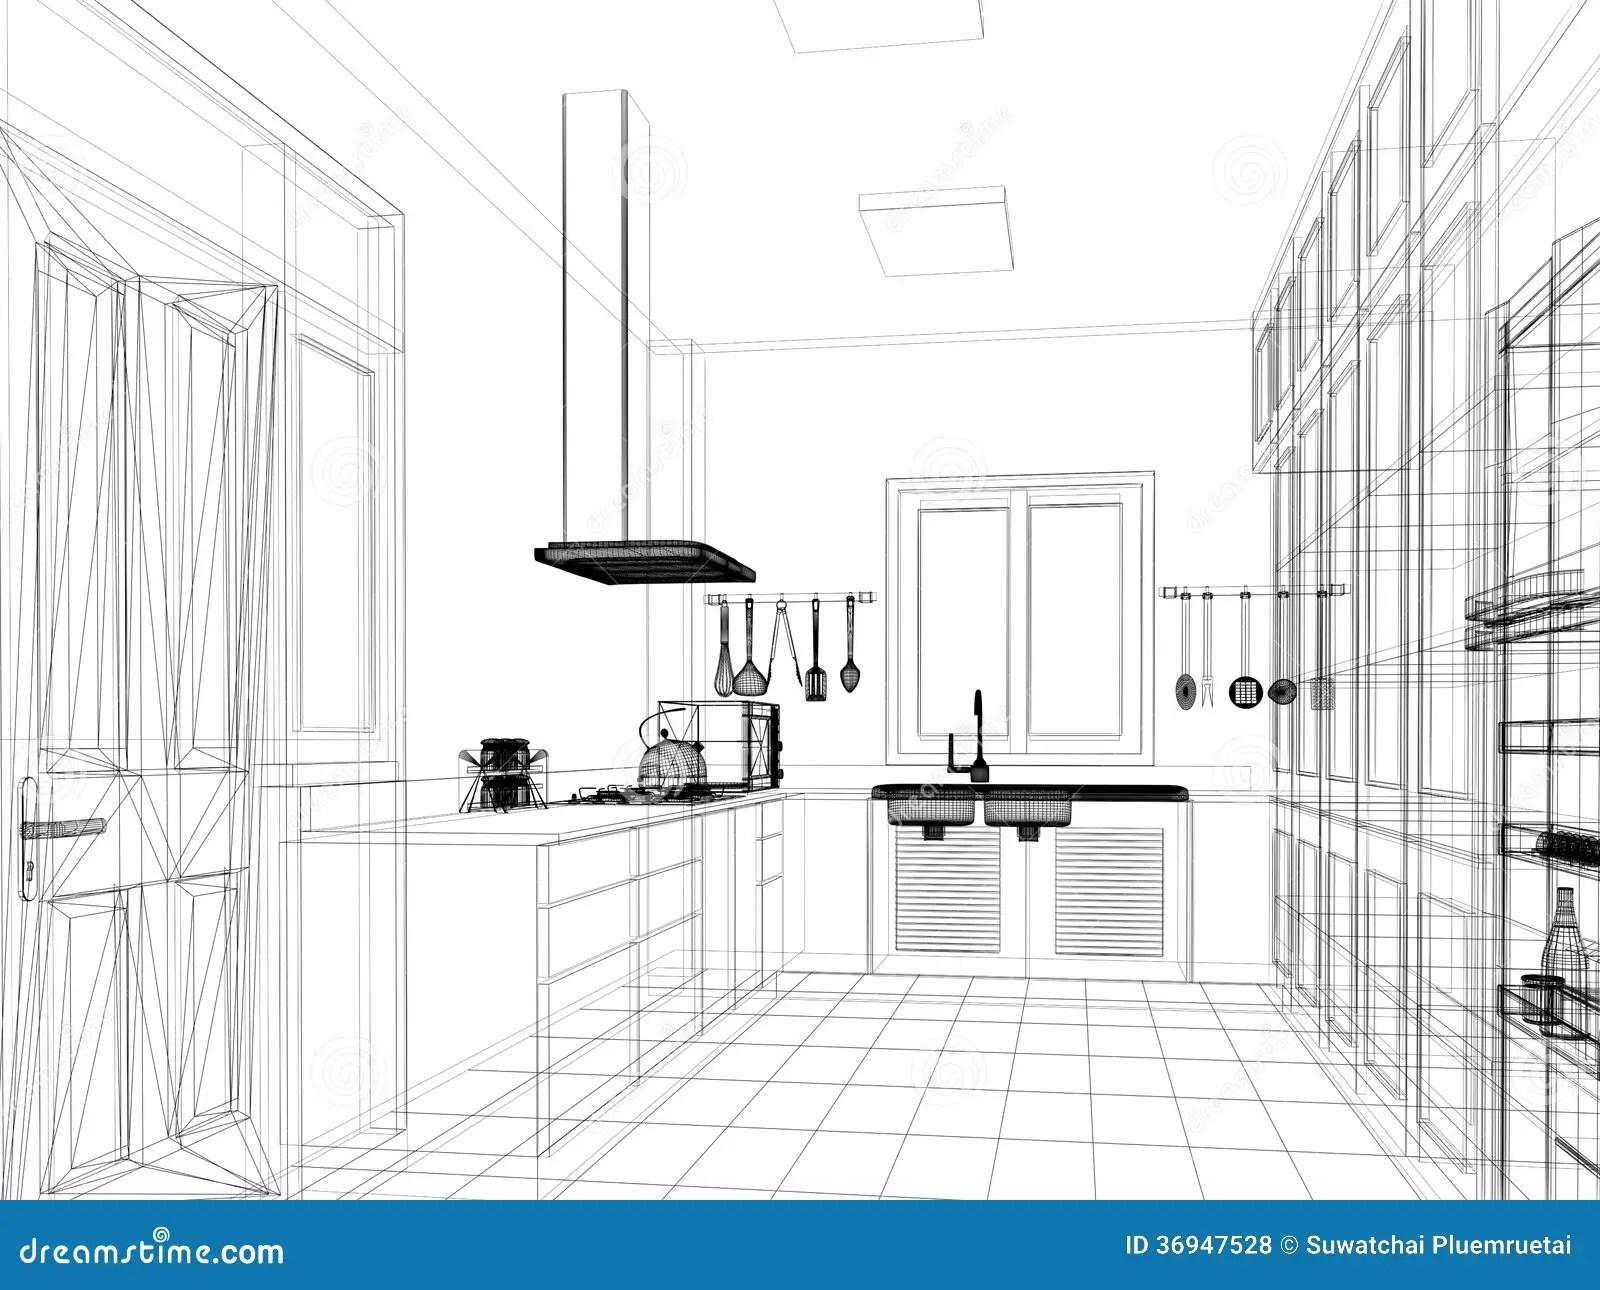 Sketch Design Of Interior Kitchen Stock Illustration